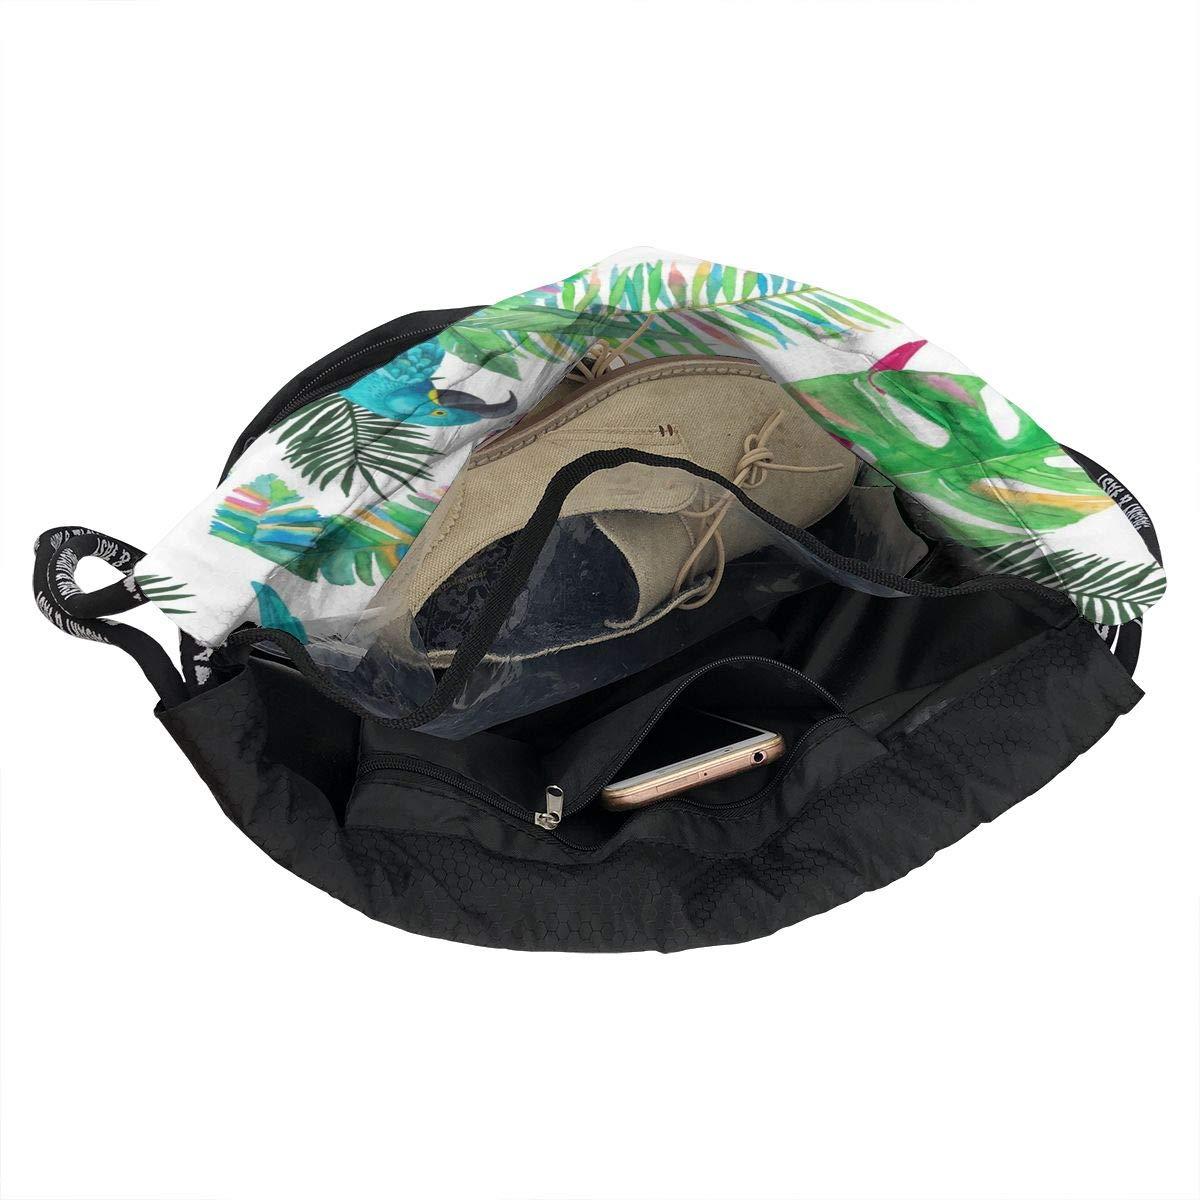 Lightweight Waterproof Large Storage Drawstring Bag For Men /& Women Parrot And Plant Cinch Backpack Sackpack Tote Sack